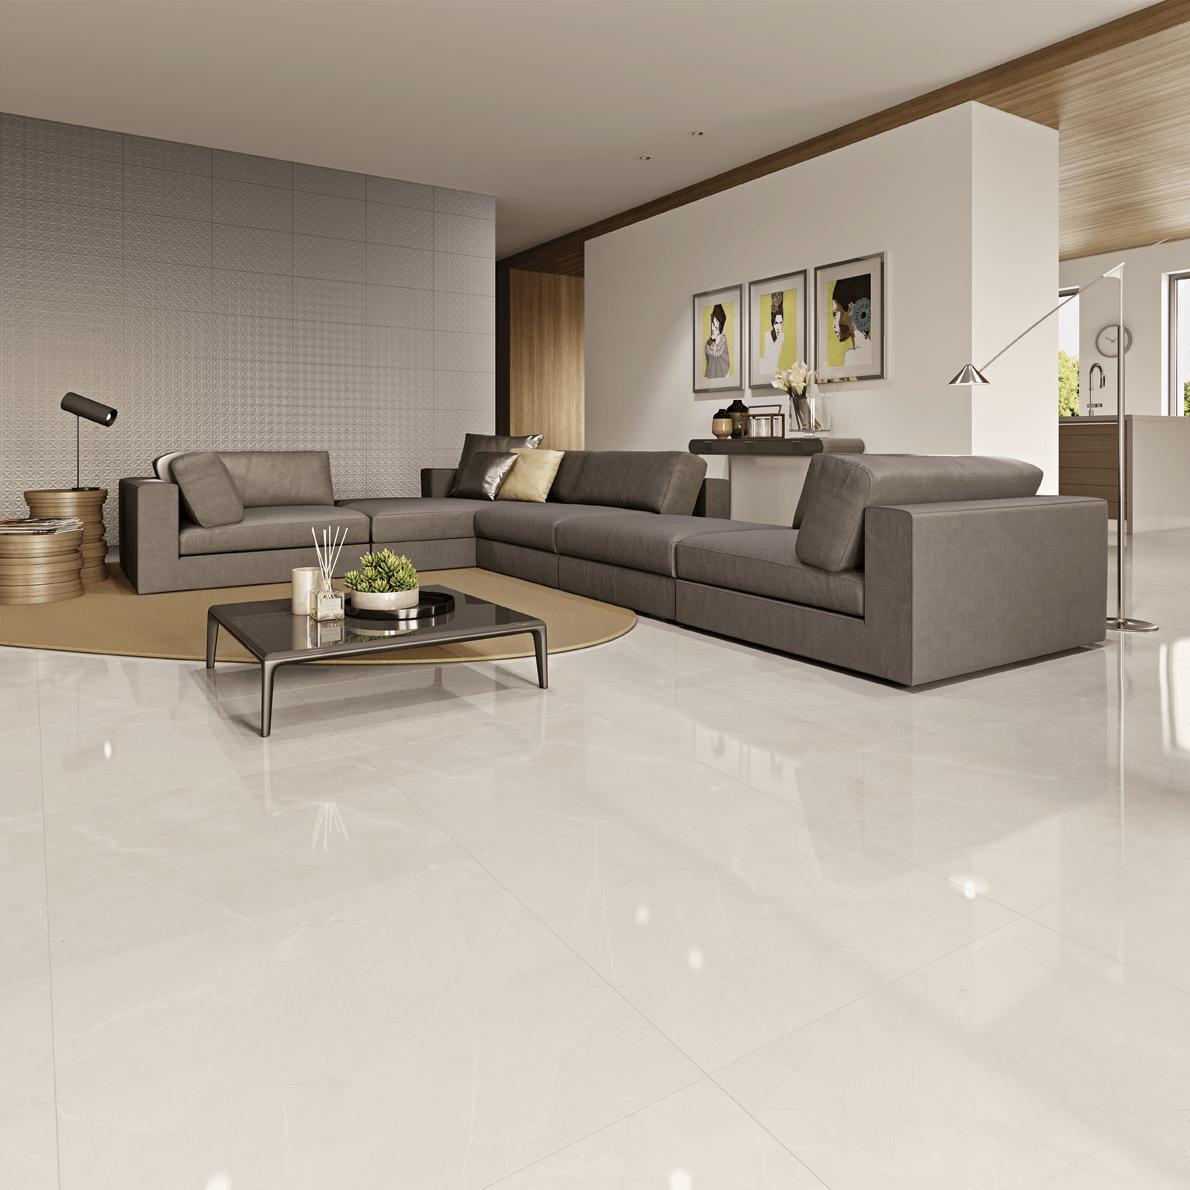 Descubra se o porcelanato polido é o piso ideal para seu imóvel